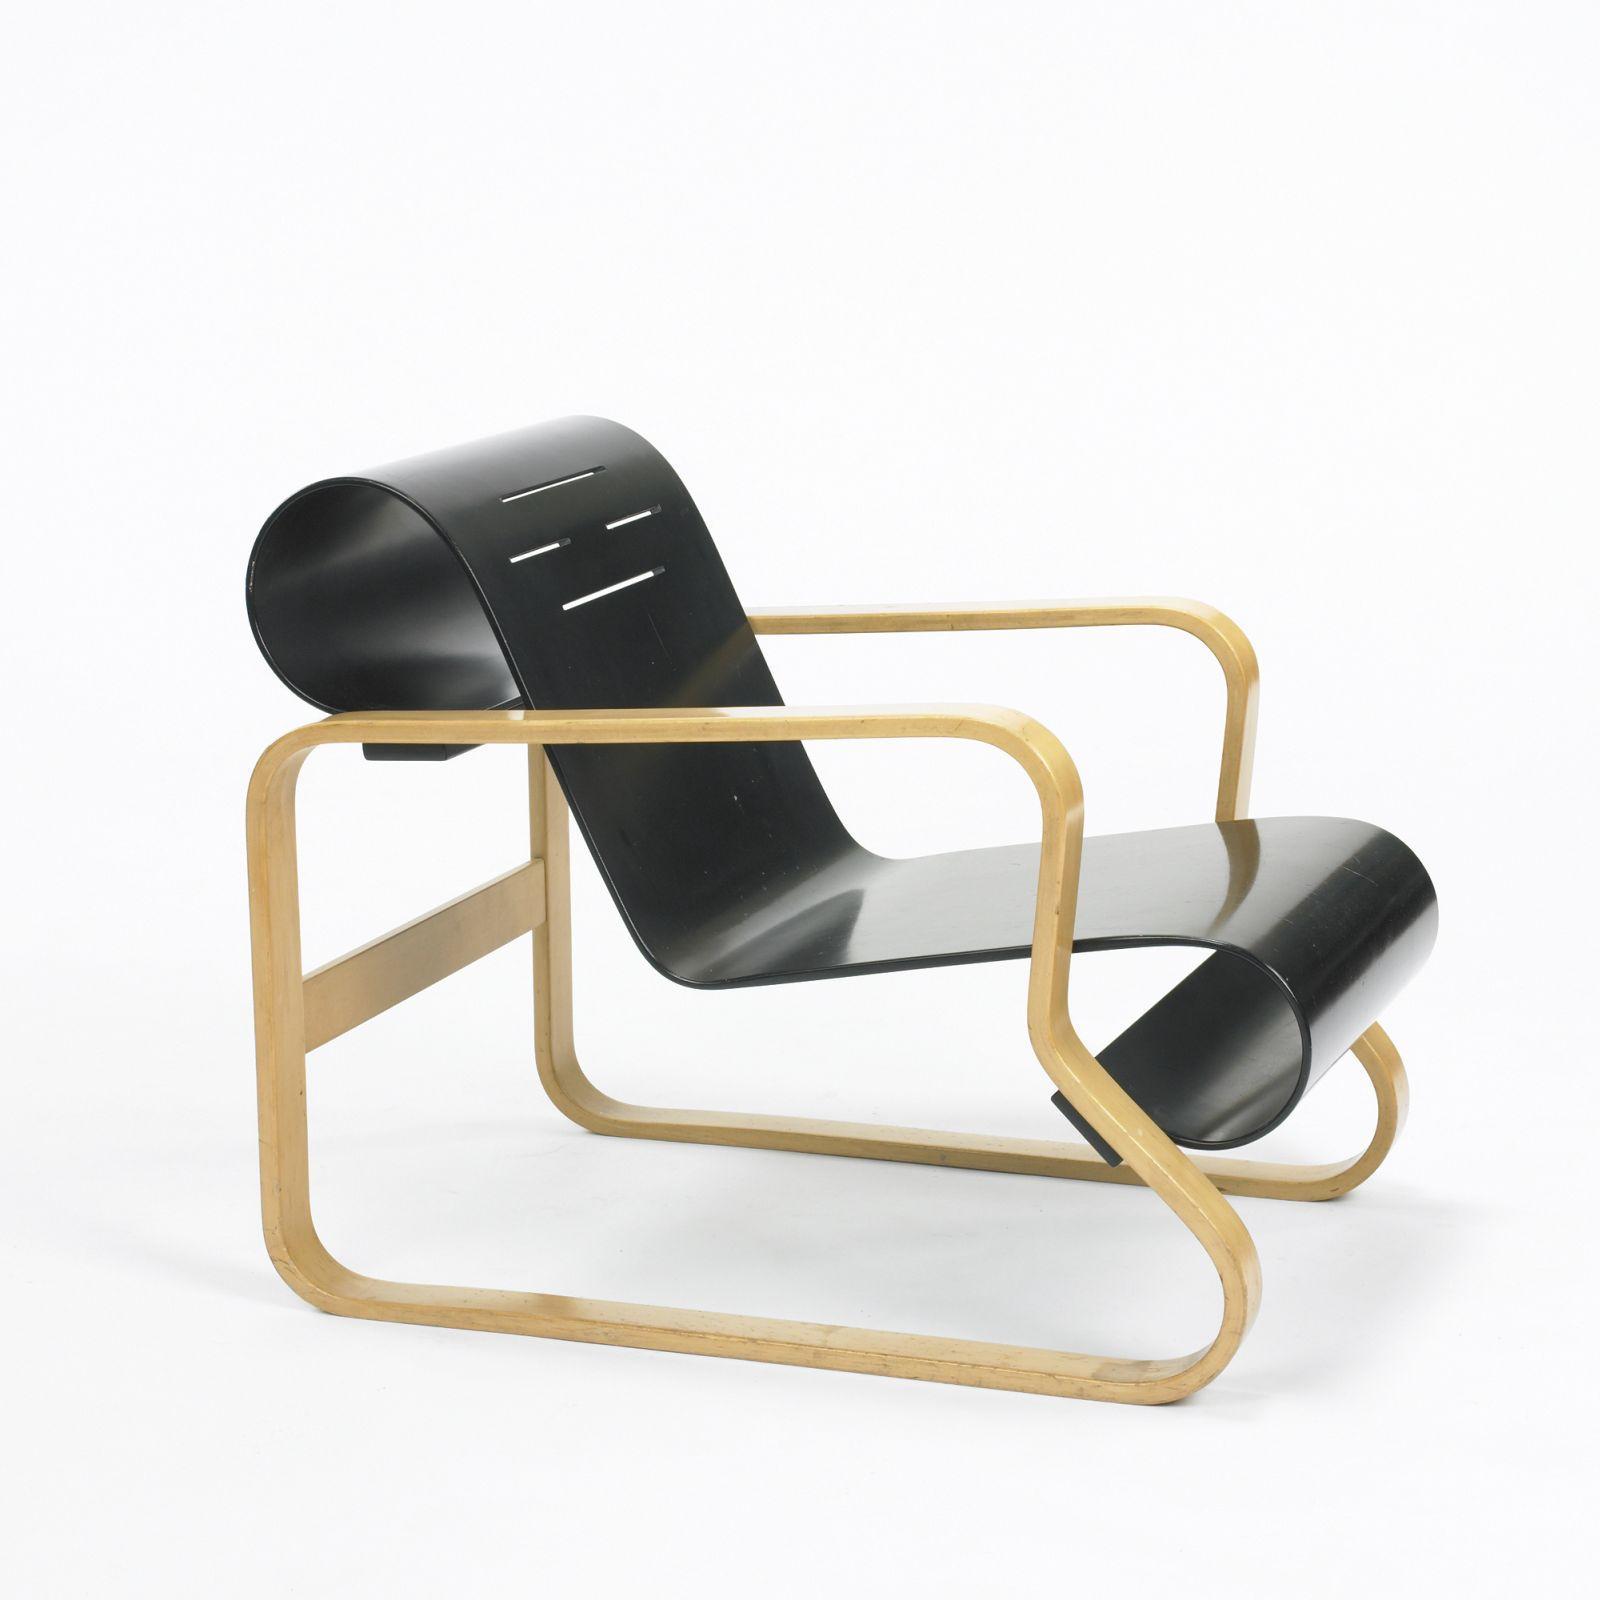 Alvar Aalto Paimio armchair, model 41